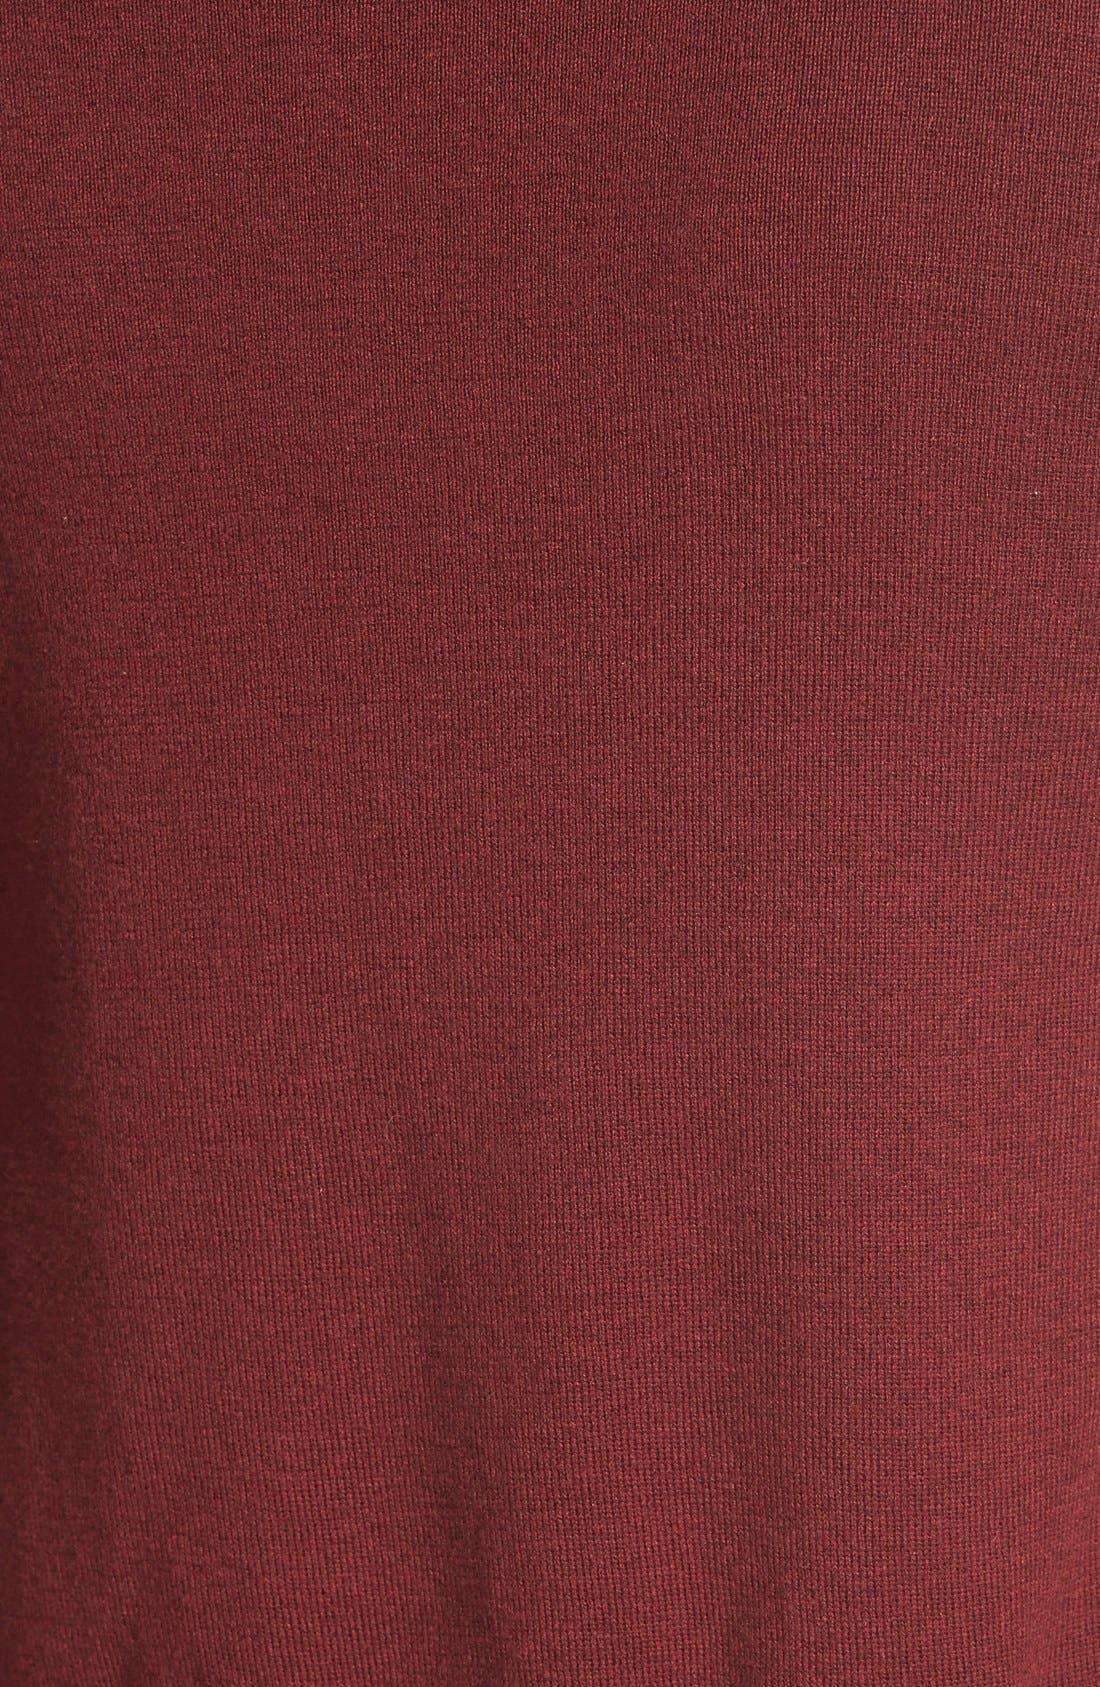 4-Way Convertible Lightweight Cardigan,                             Alternate thumbnail 224, color,